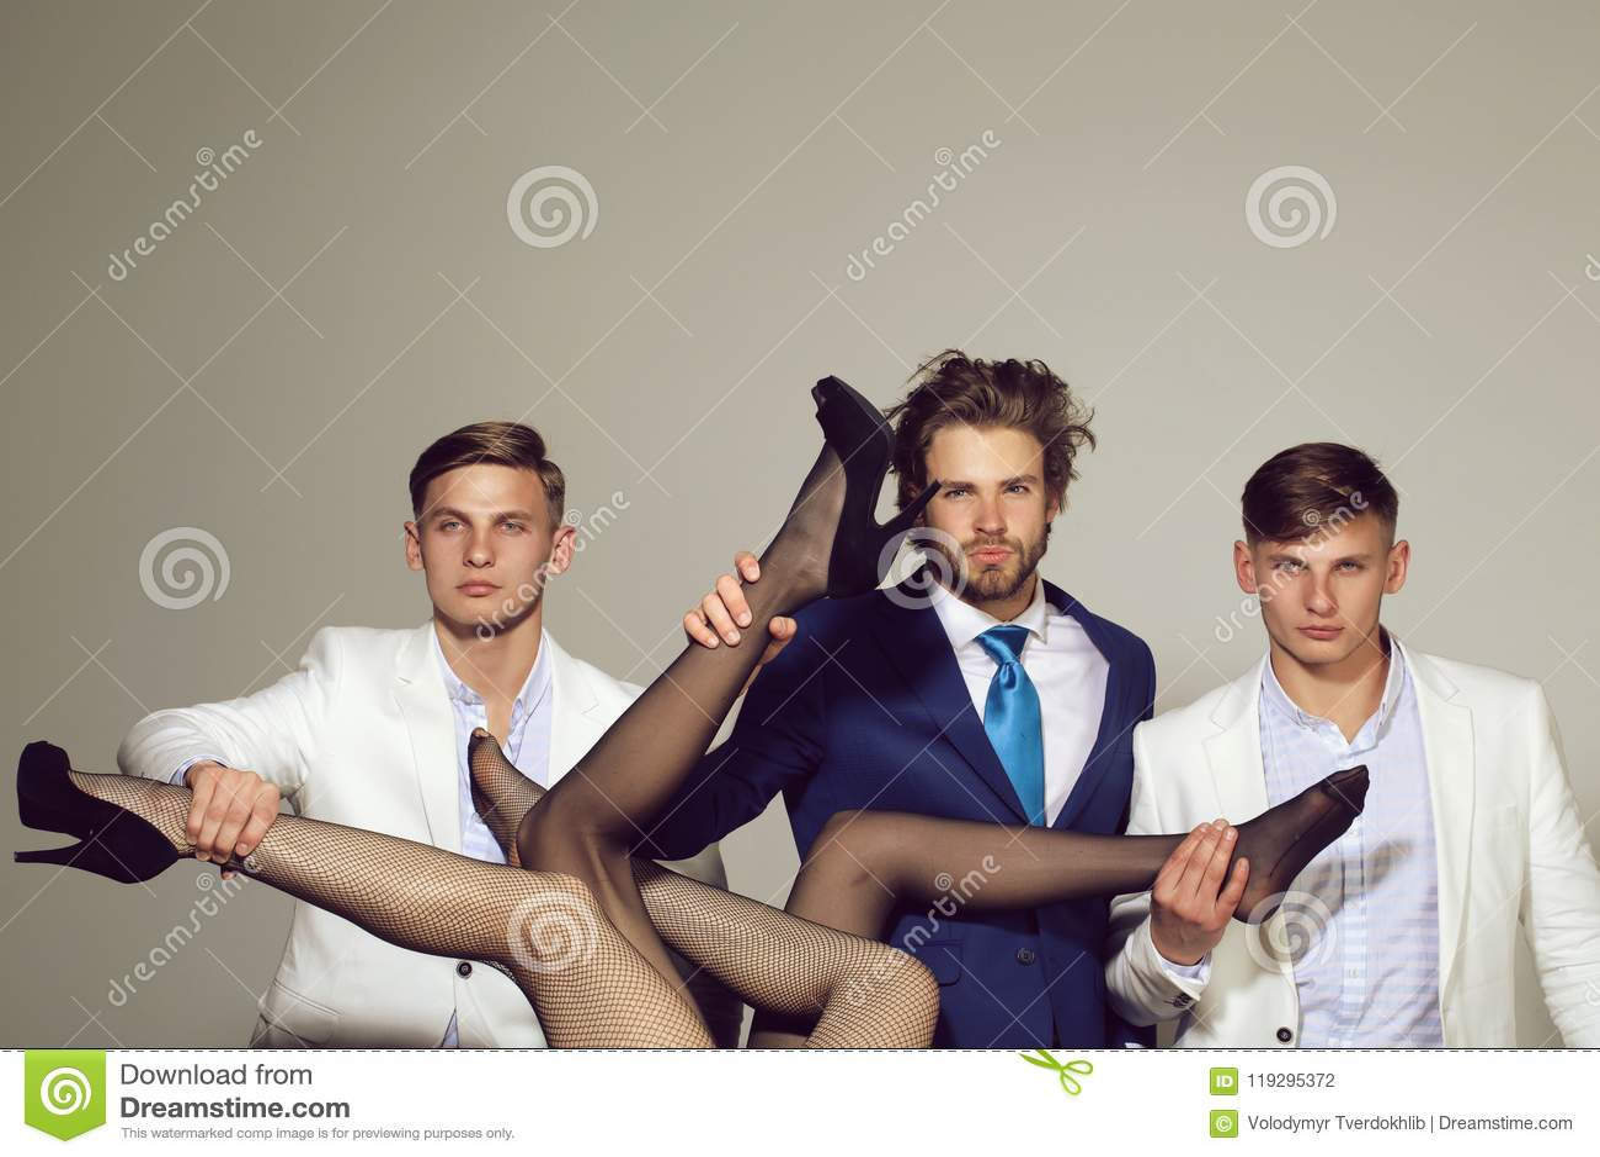 Henpecked мода и дело, люди держа женские ноги, роскошь и патриархат